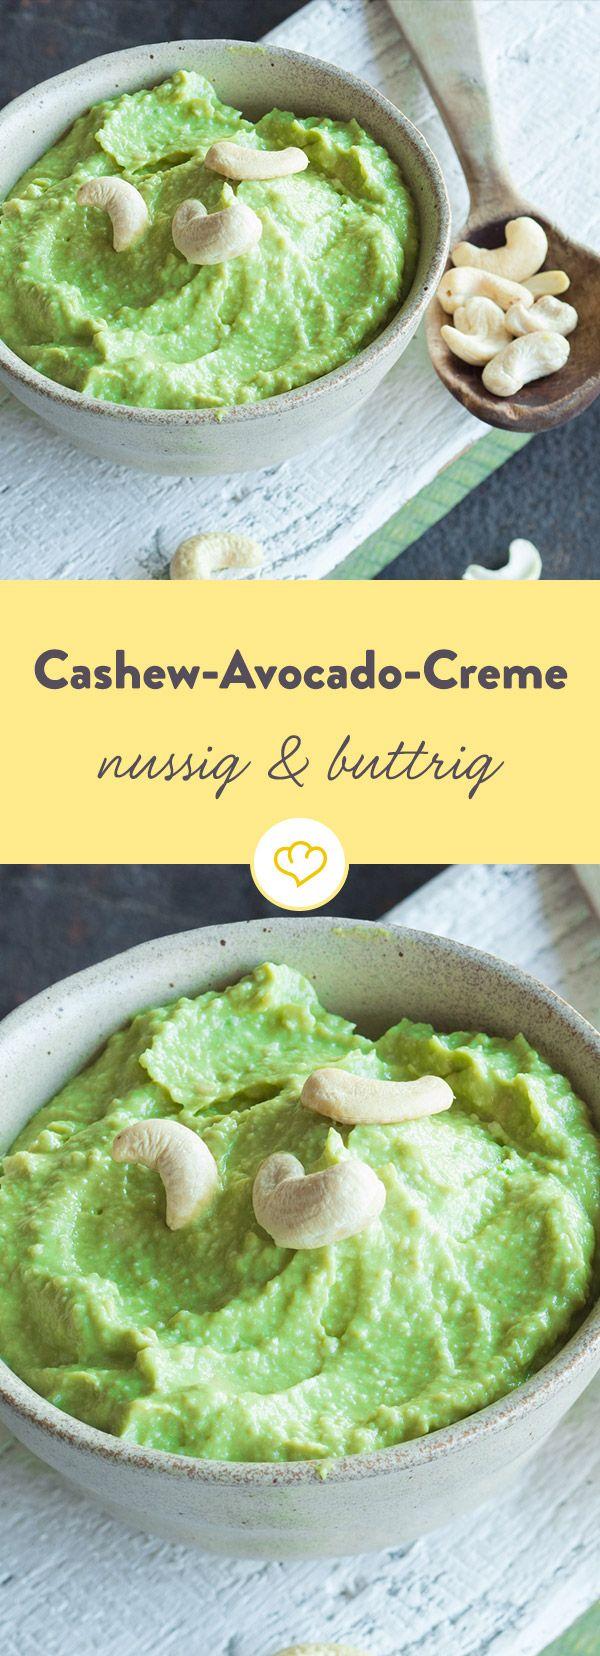 Cashew-Avocado-Creme – admax w.